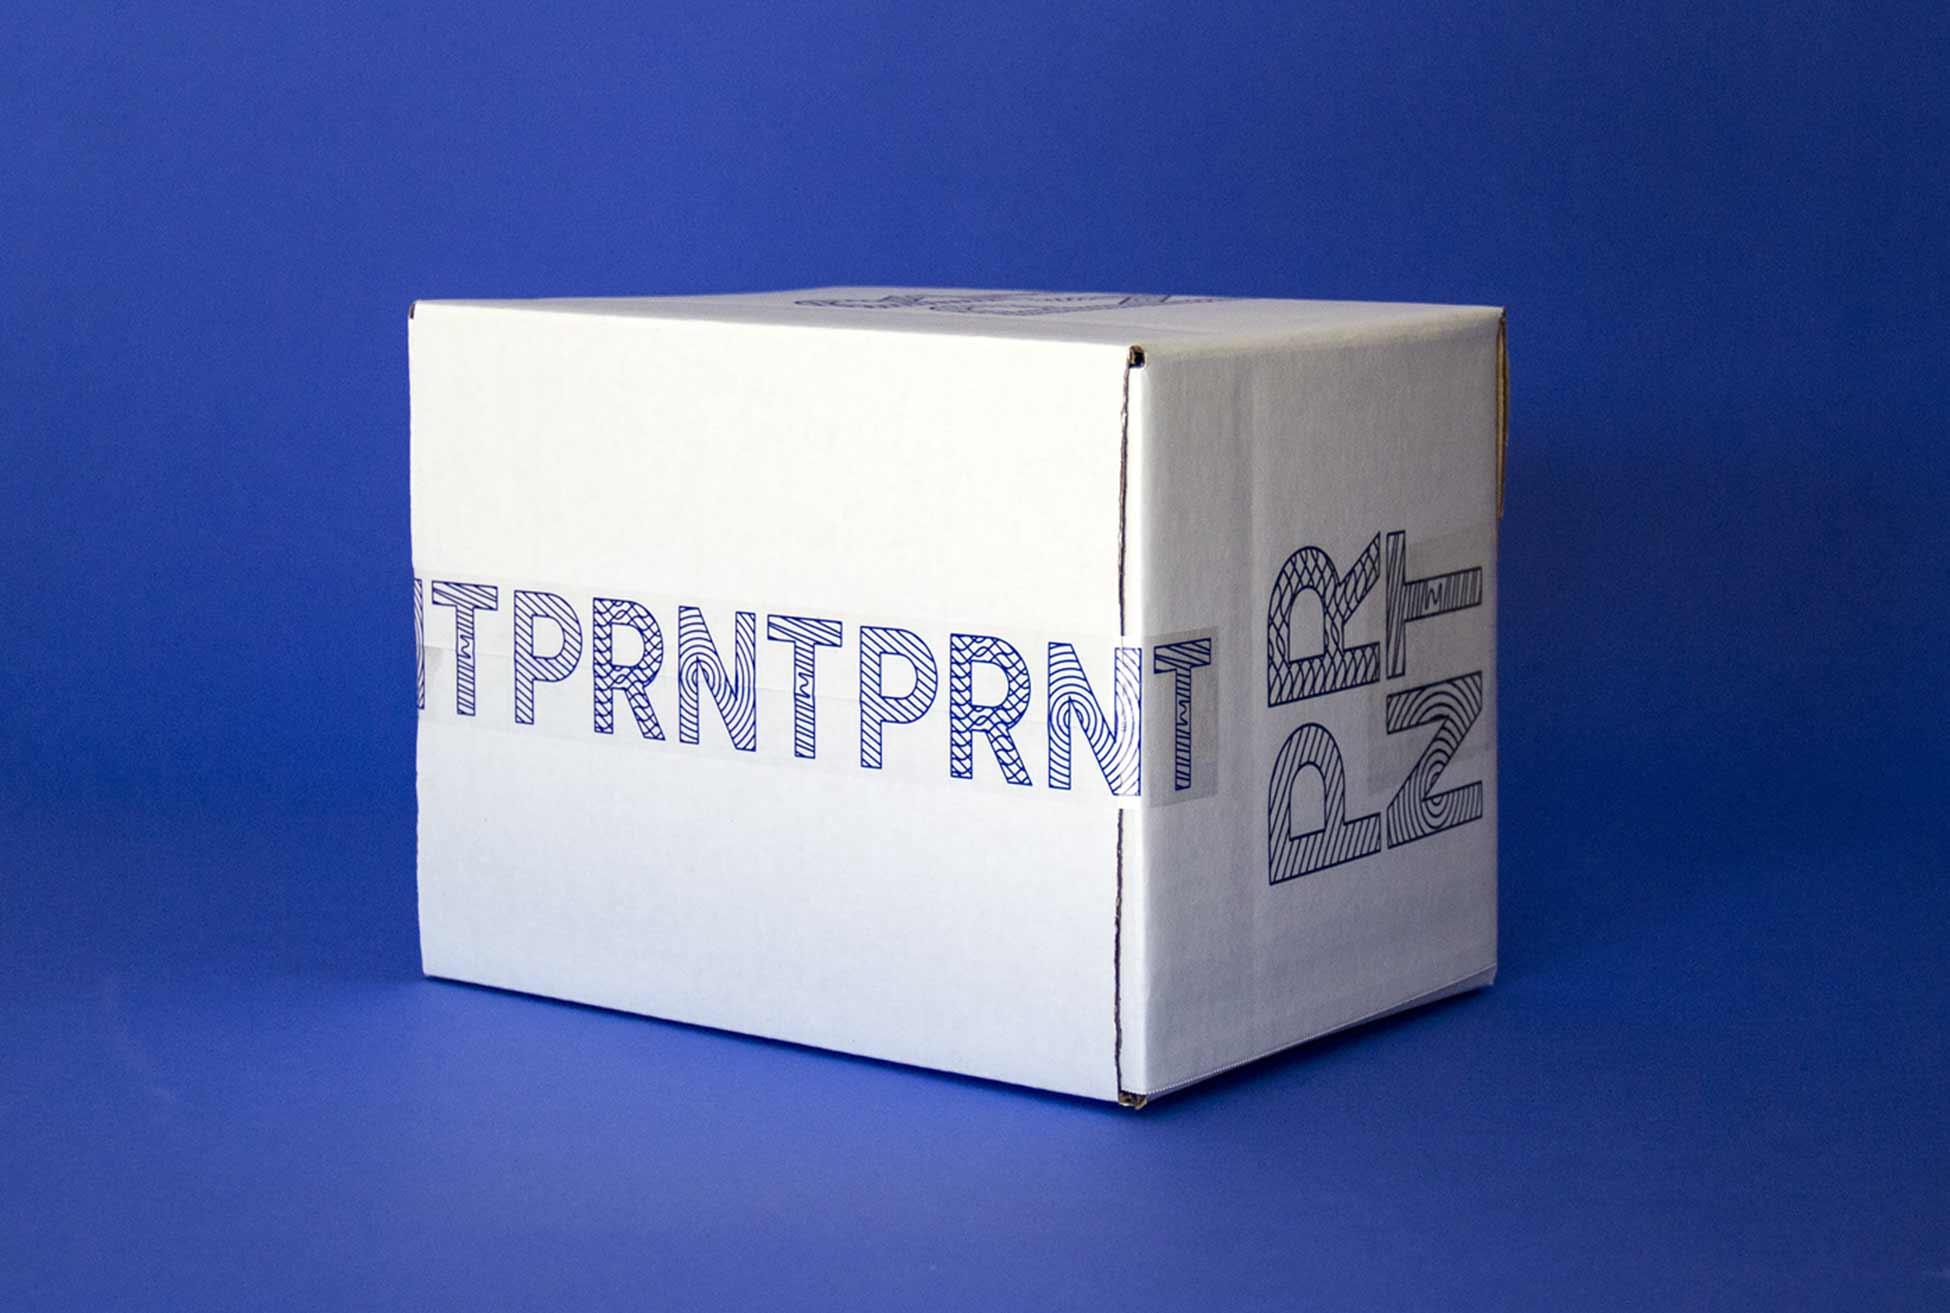 PRNT_box-tape.jpg